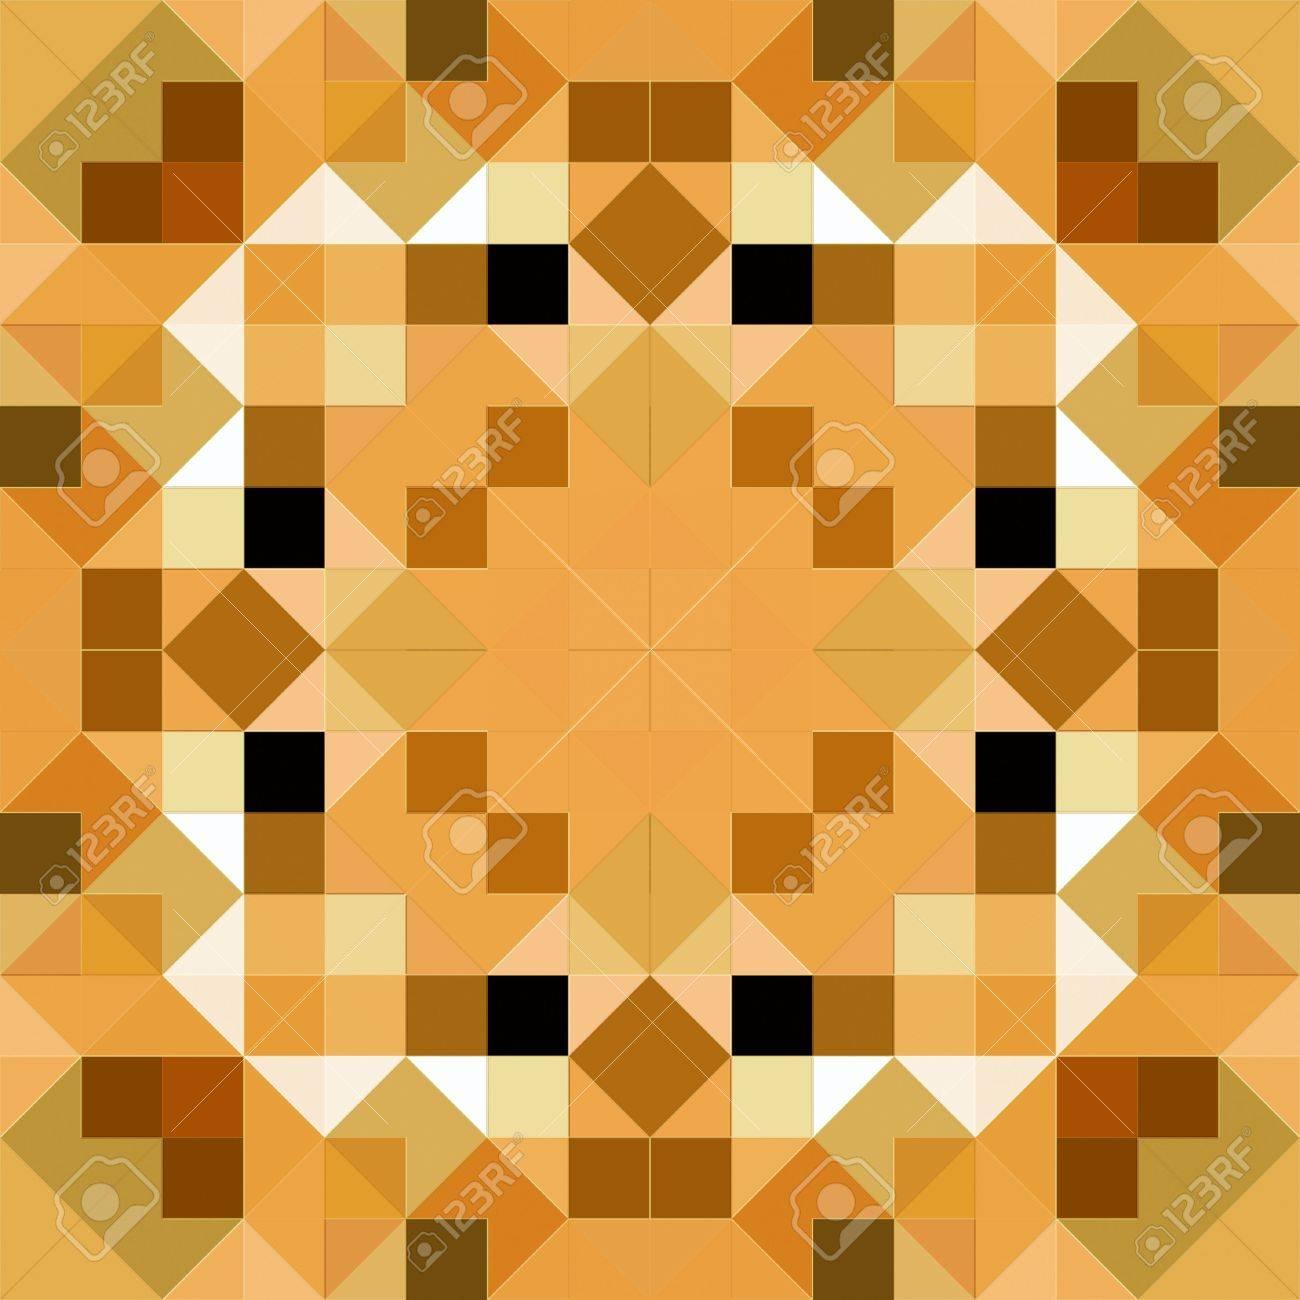 Glossy Texture Seamless Stock Photo Seamless Texture